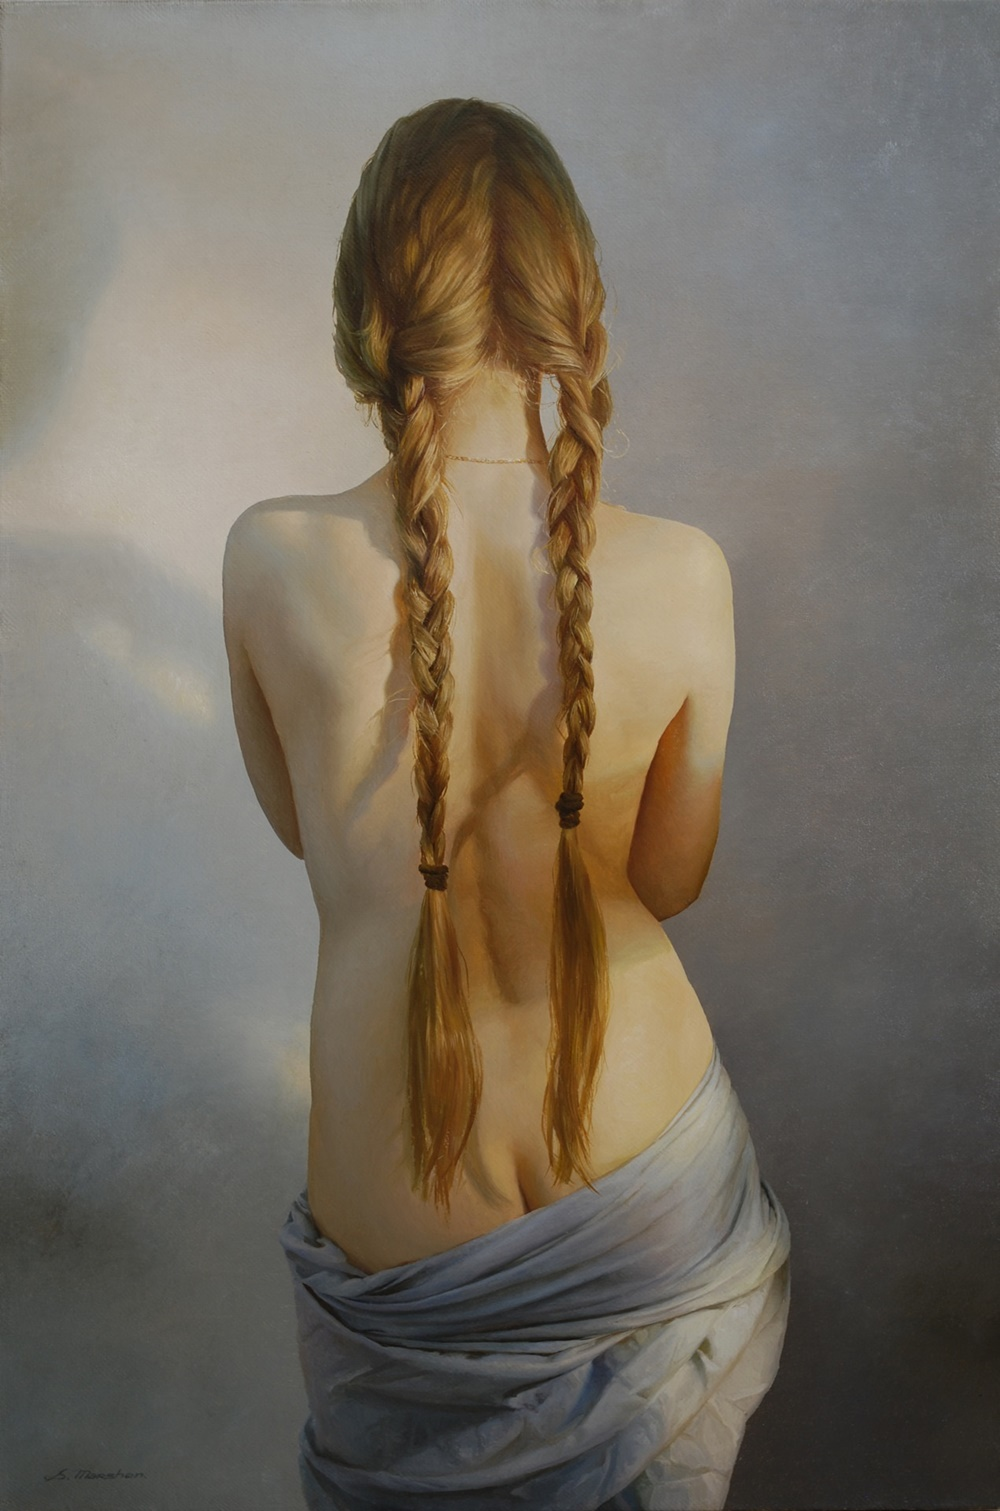 Women's images by a Russian realist artist Sergey Marshennikov - 17